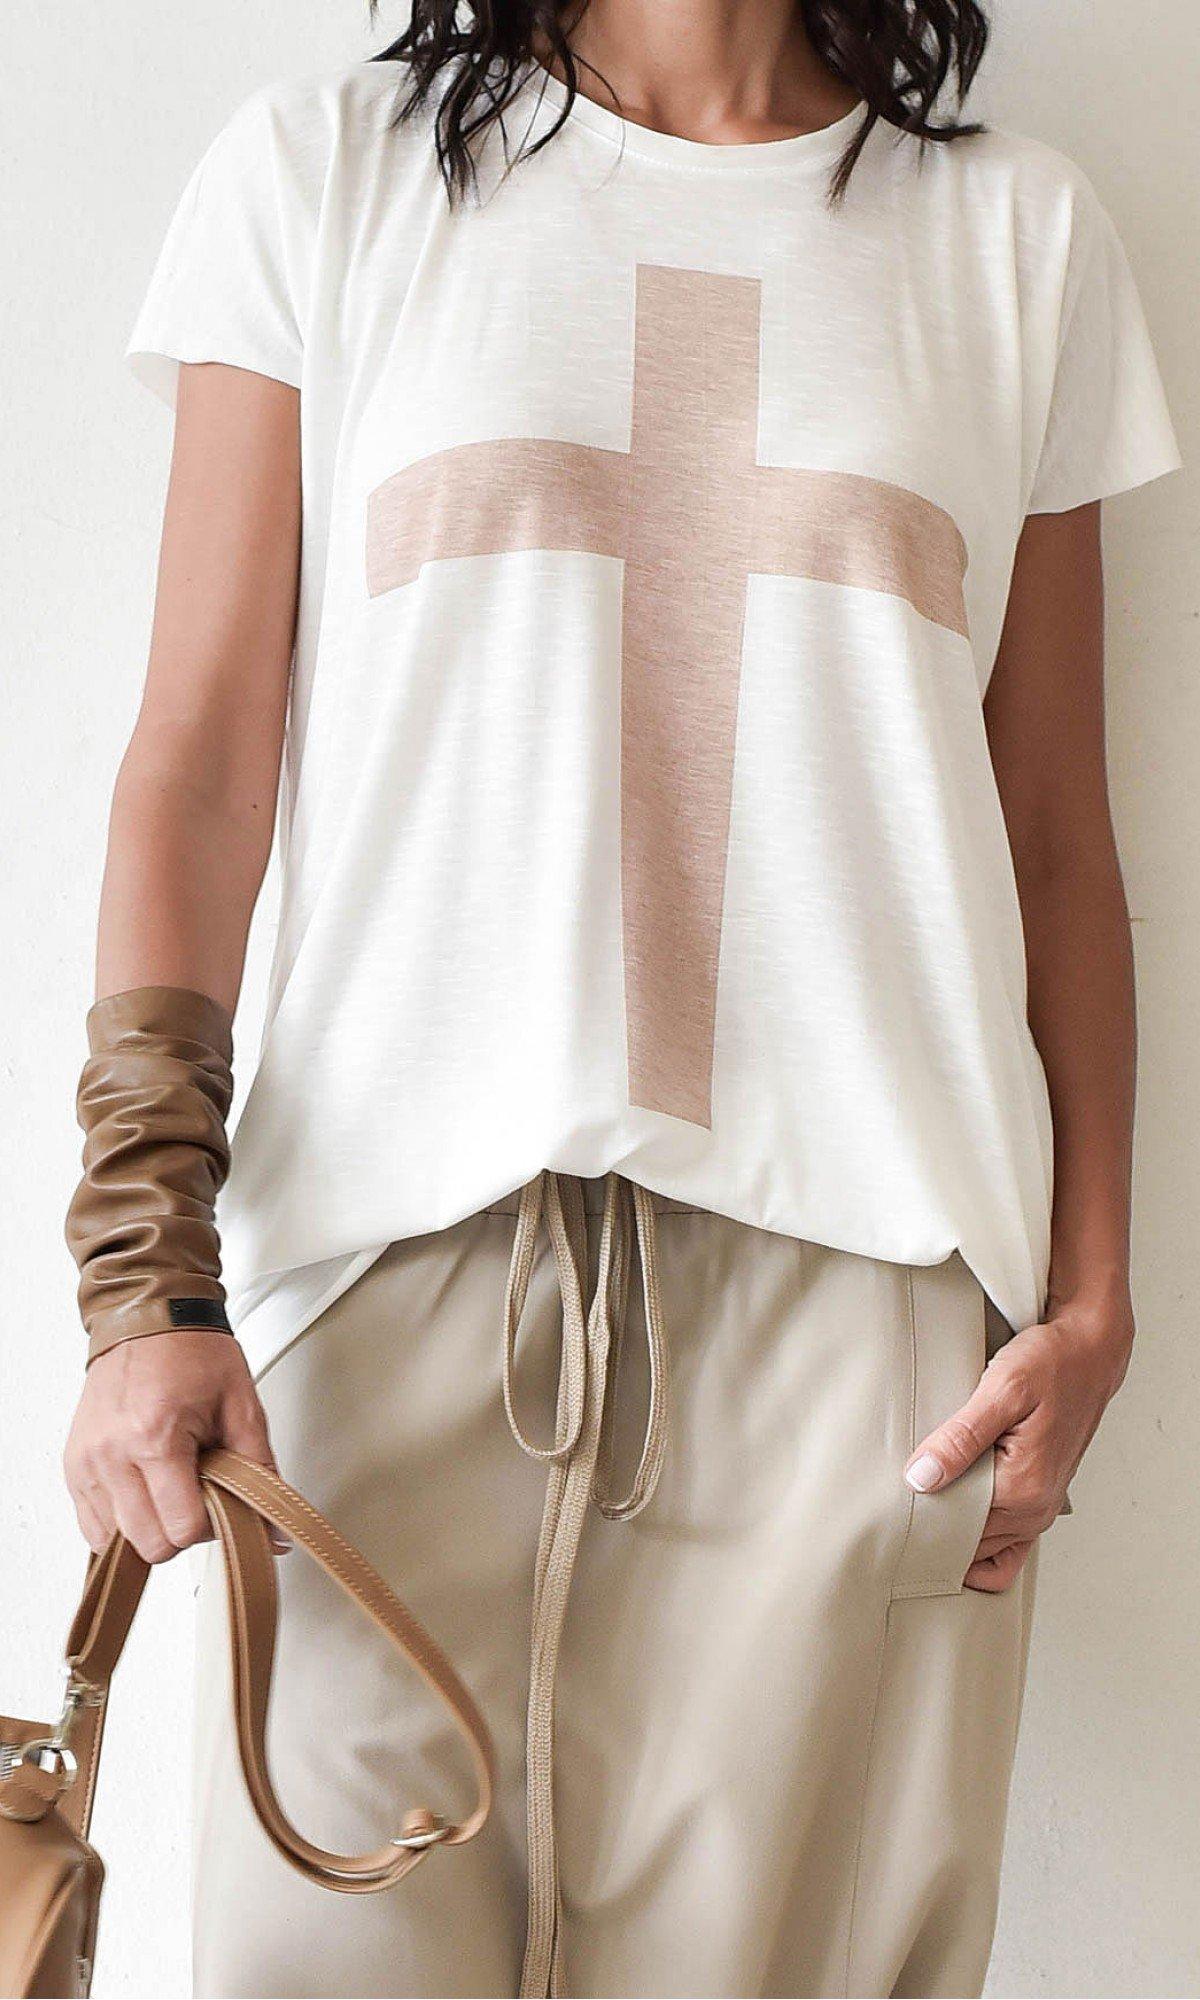 White Cotton 'Cross' Tee A12146